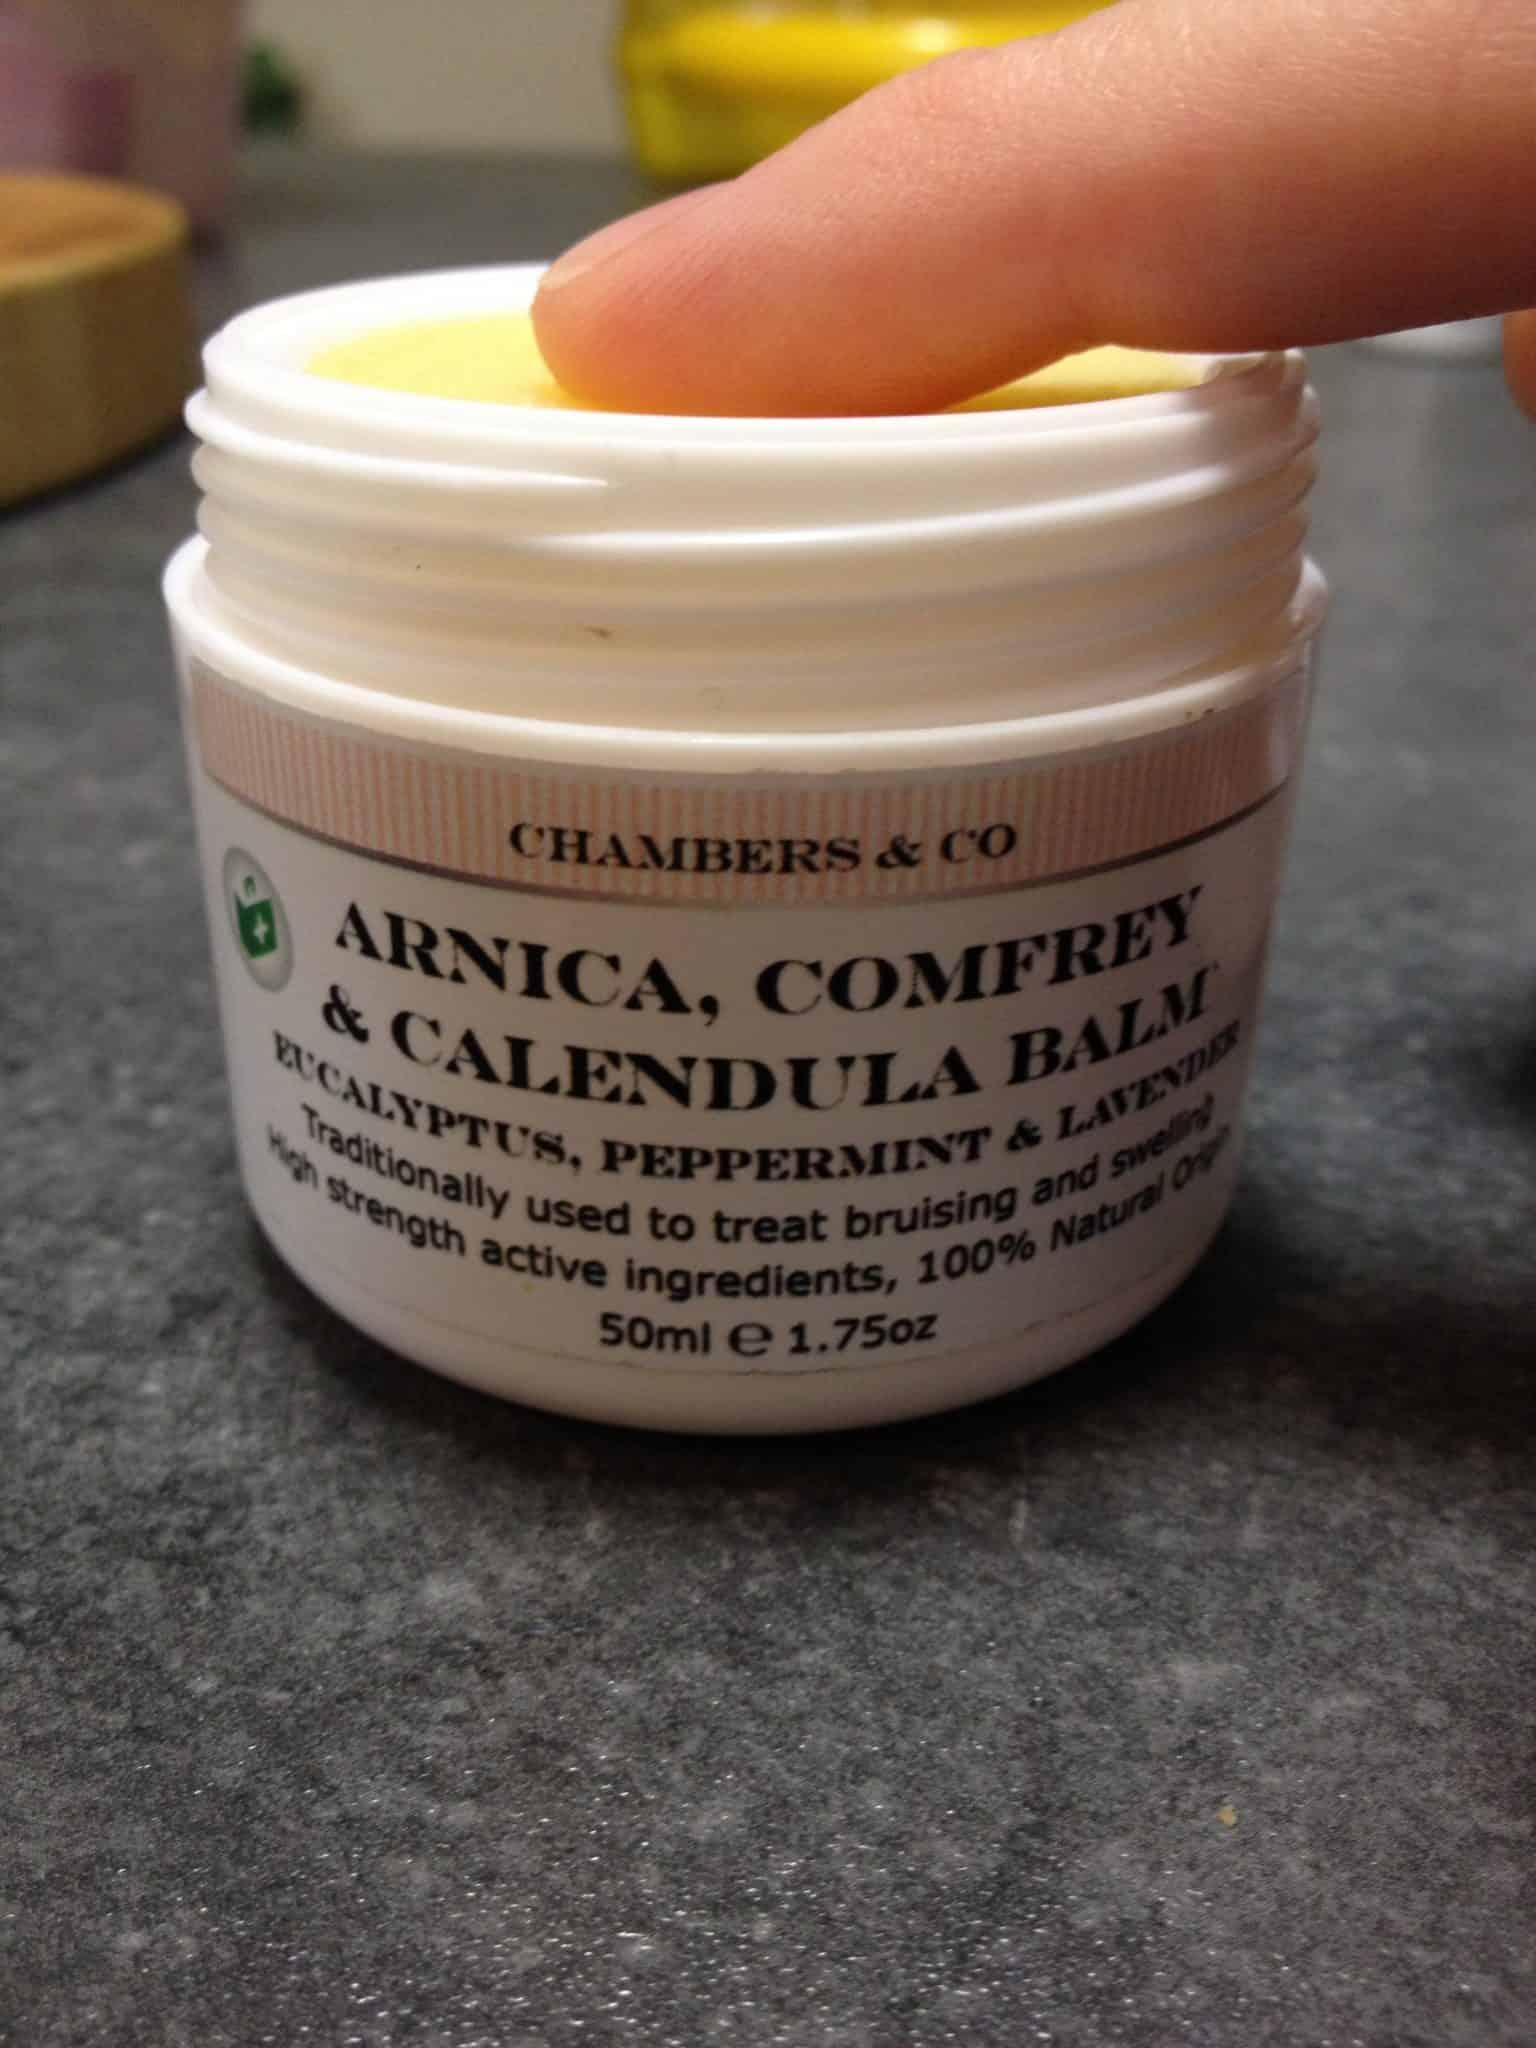 Arnica, Comfrey & Calendula Balm